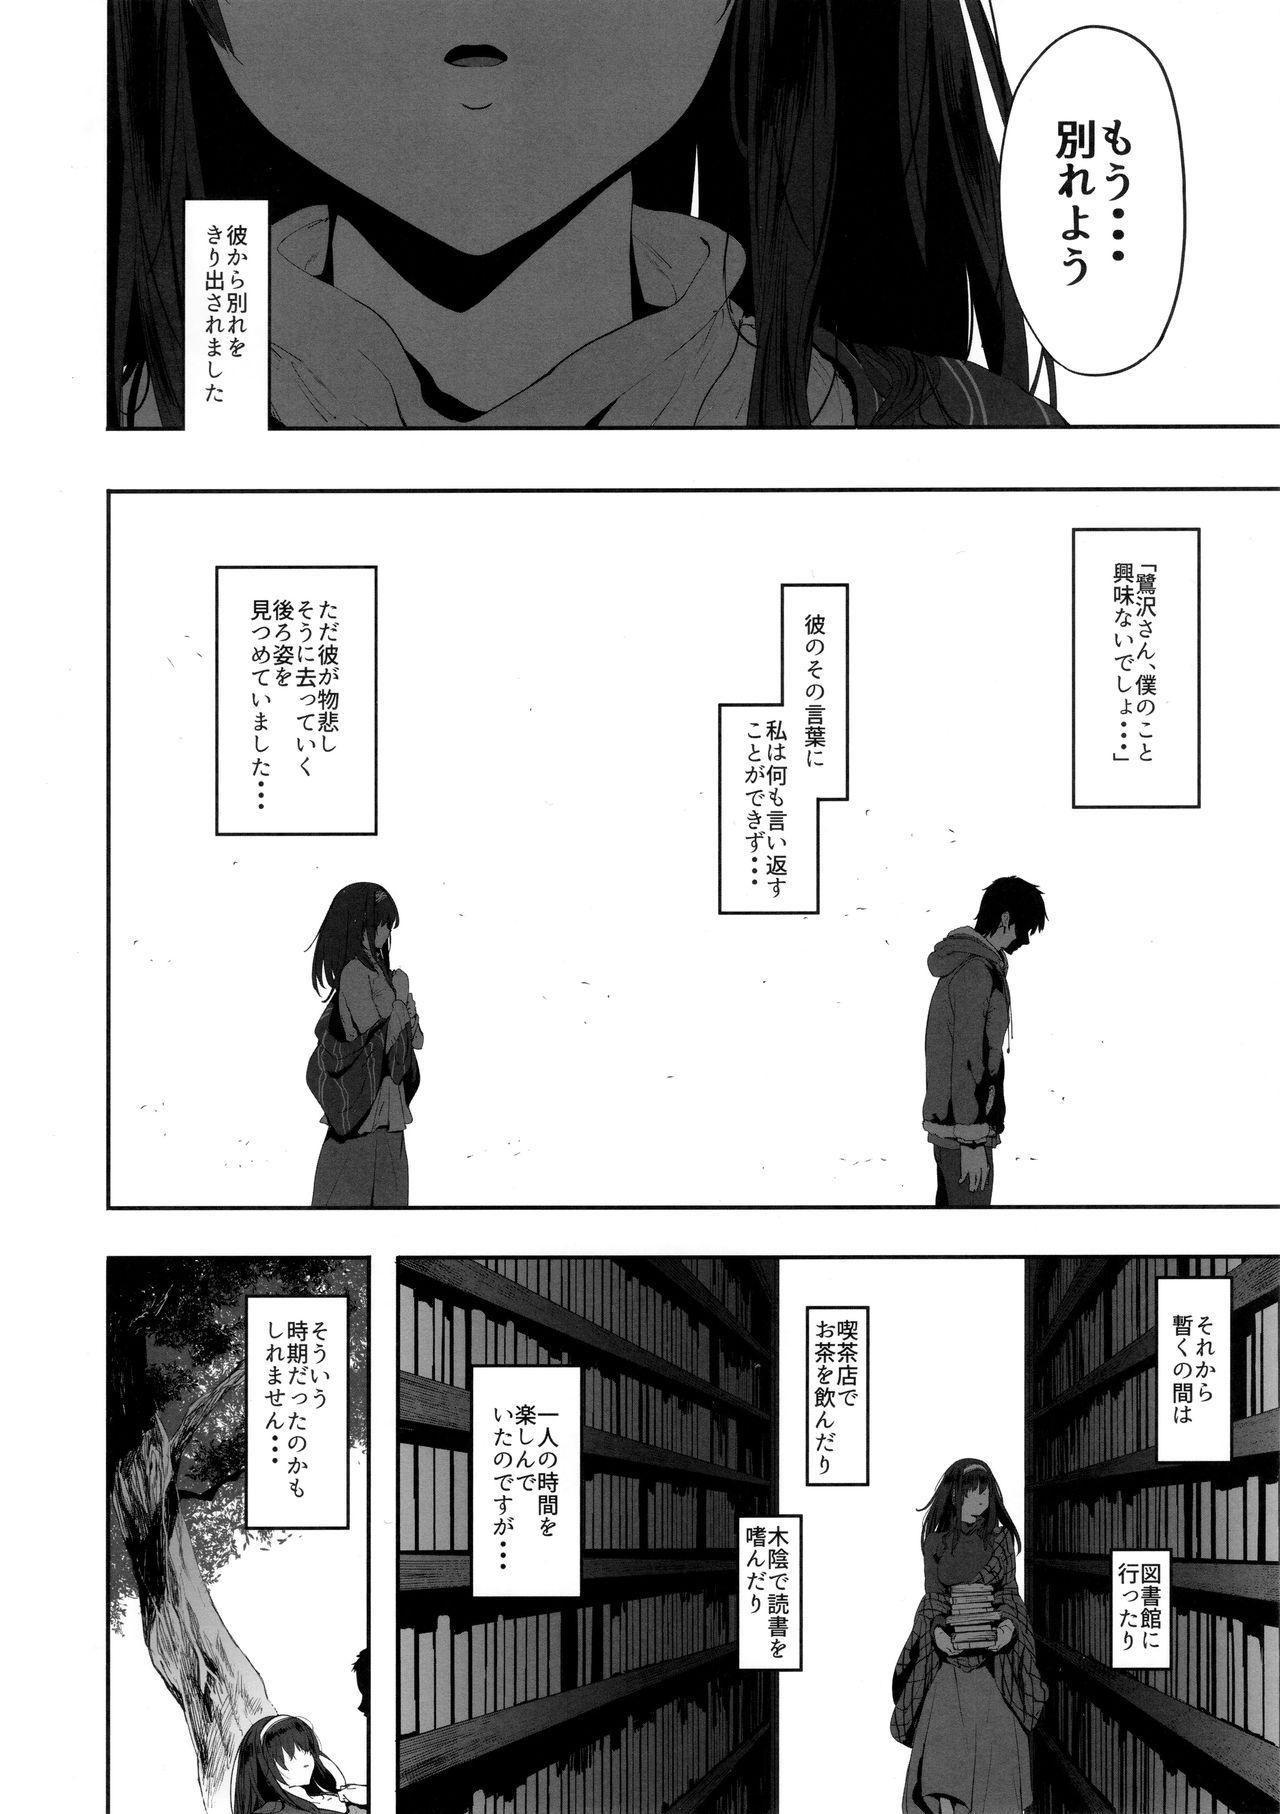 Sagisawa Fumika wa Yoku Moteru 4